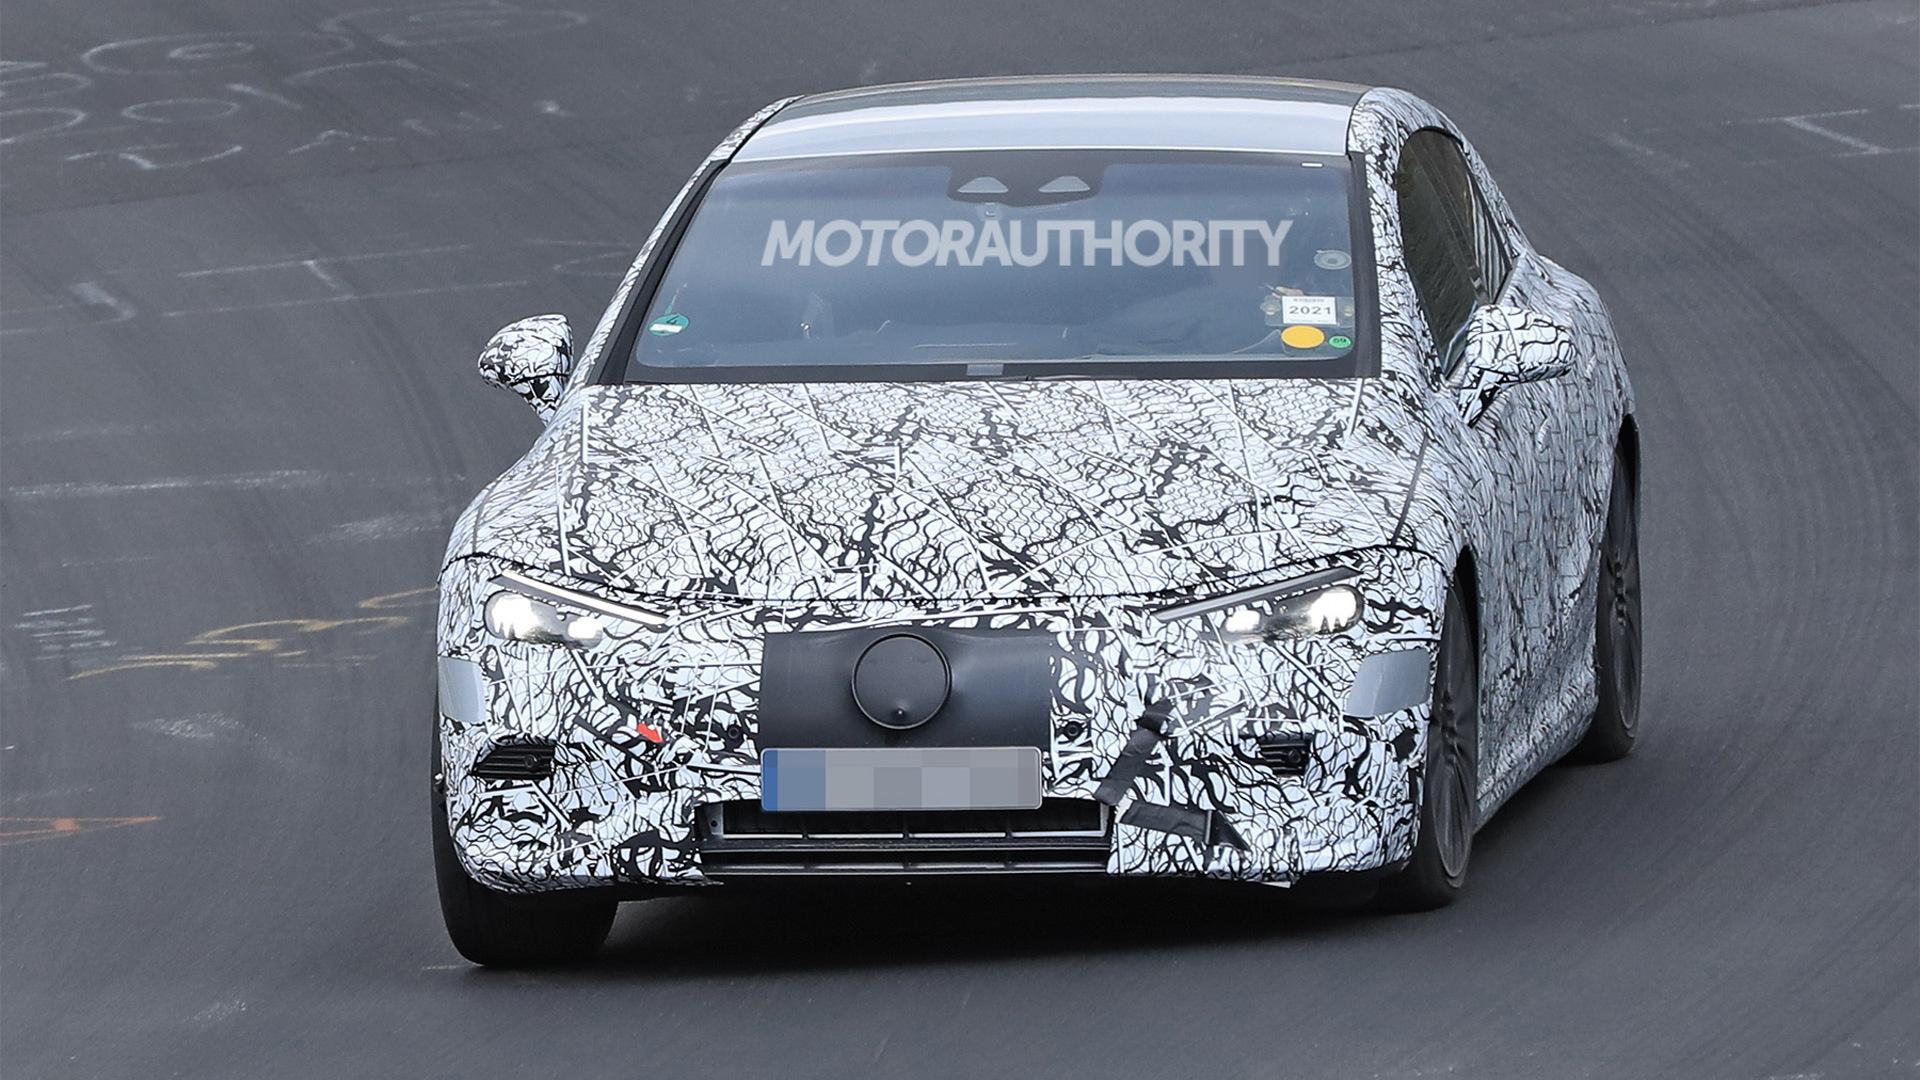 2022 Mercedes-Benz EQE spy shots - Photo credit:S. Baldauf/SB-Medien